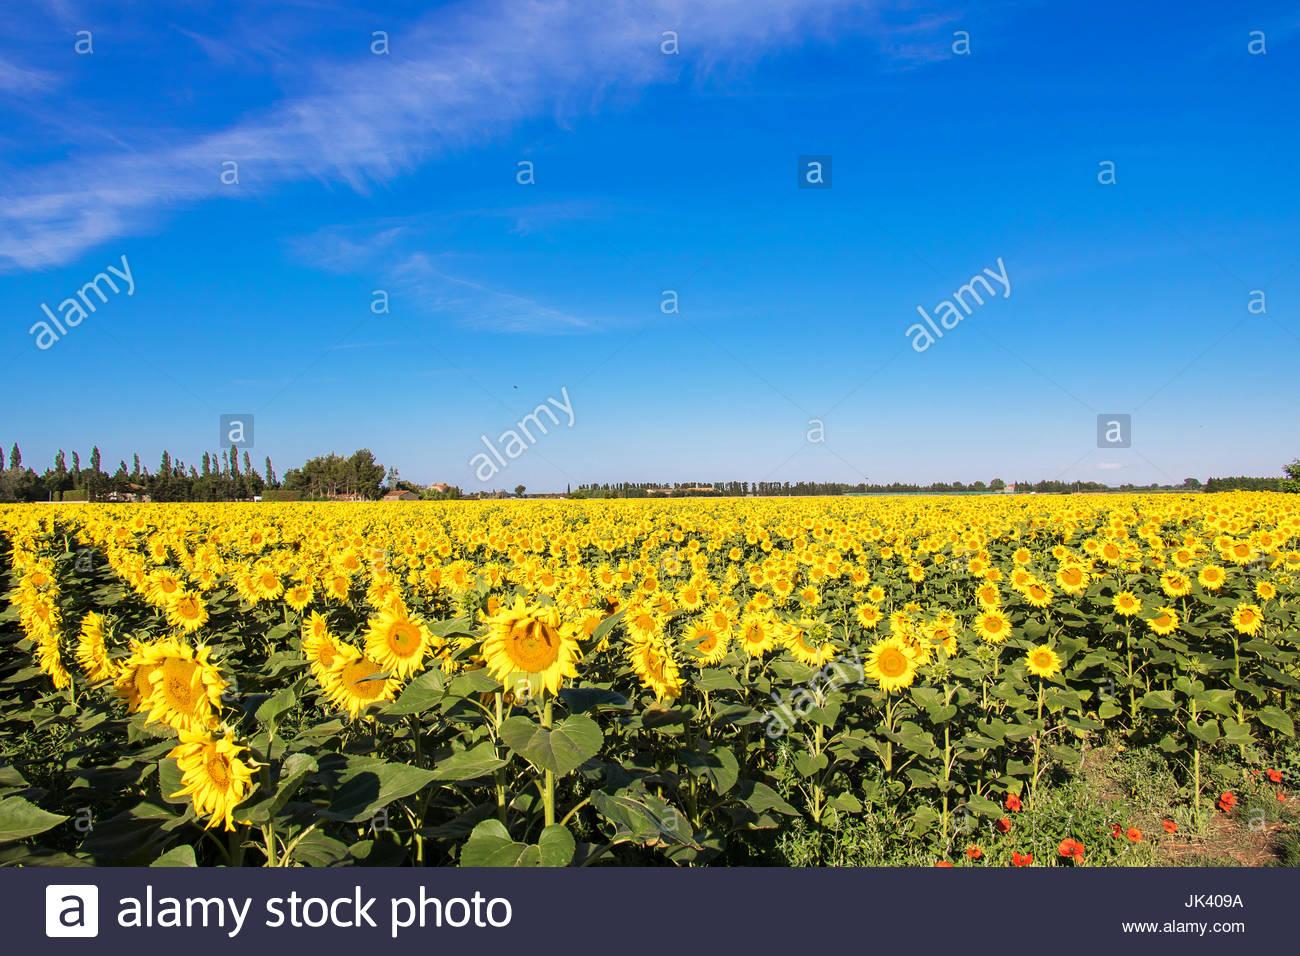 Sunflowers Provence France Sunflower Landscape Flowers With Sunlight  Beautiful Sunflower Blooms Sunflower Against Sky Giant Sunflower Field Sun